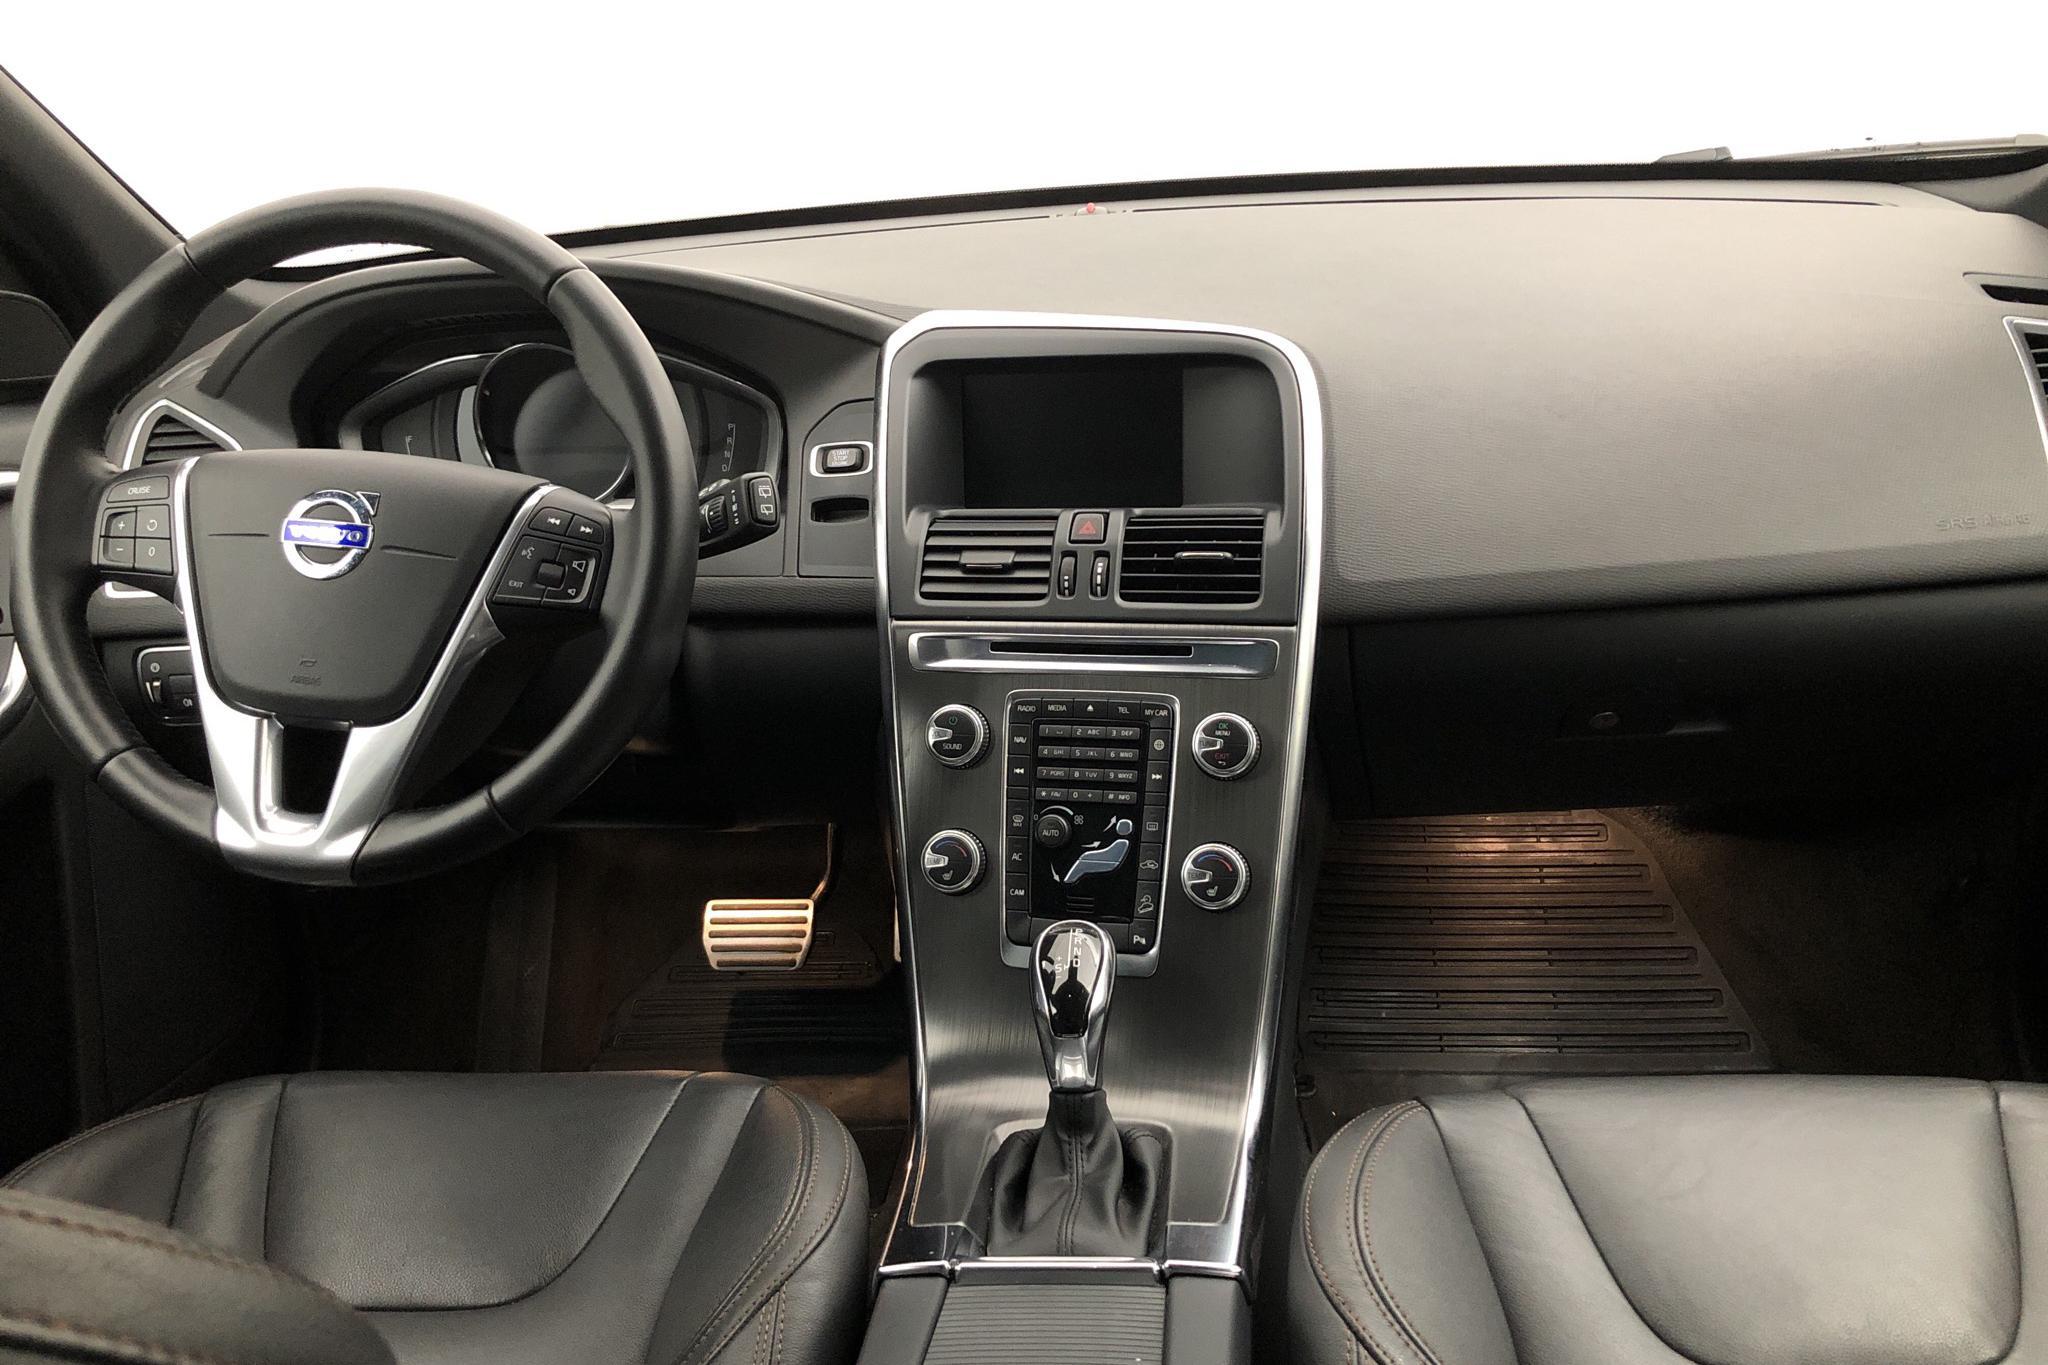 Volvo XC60 T6 AWD (306hk) - 66 560 km - Automatic - black - 2016